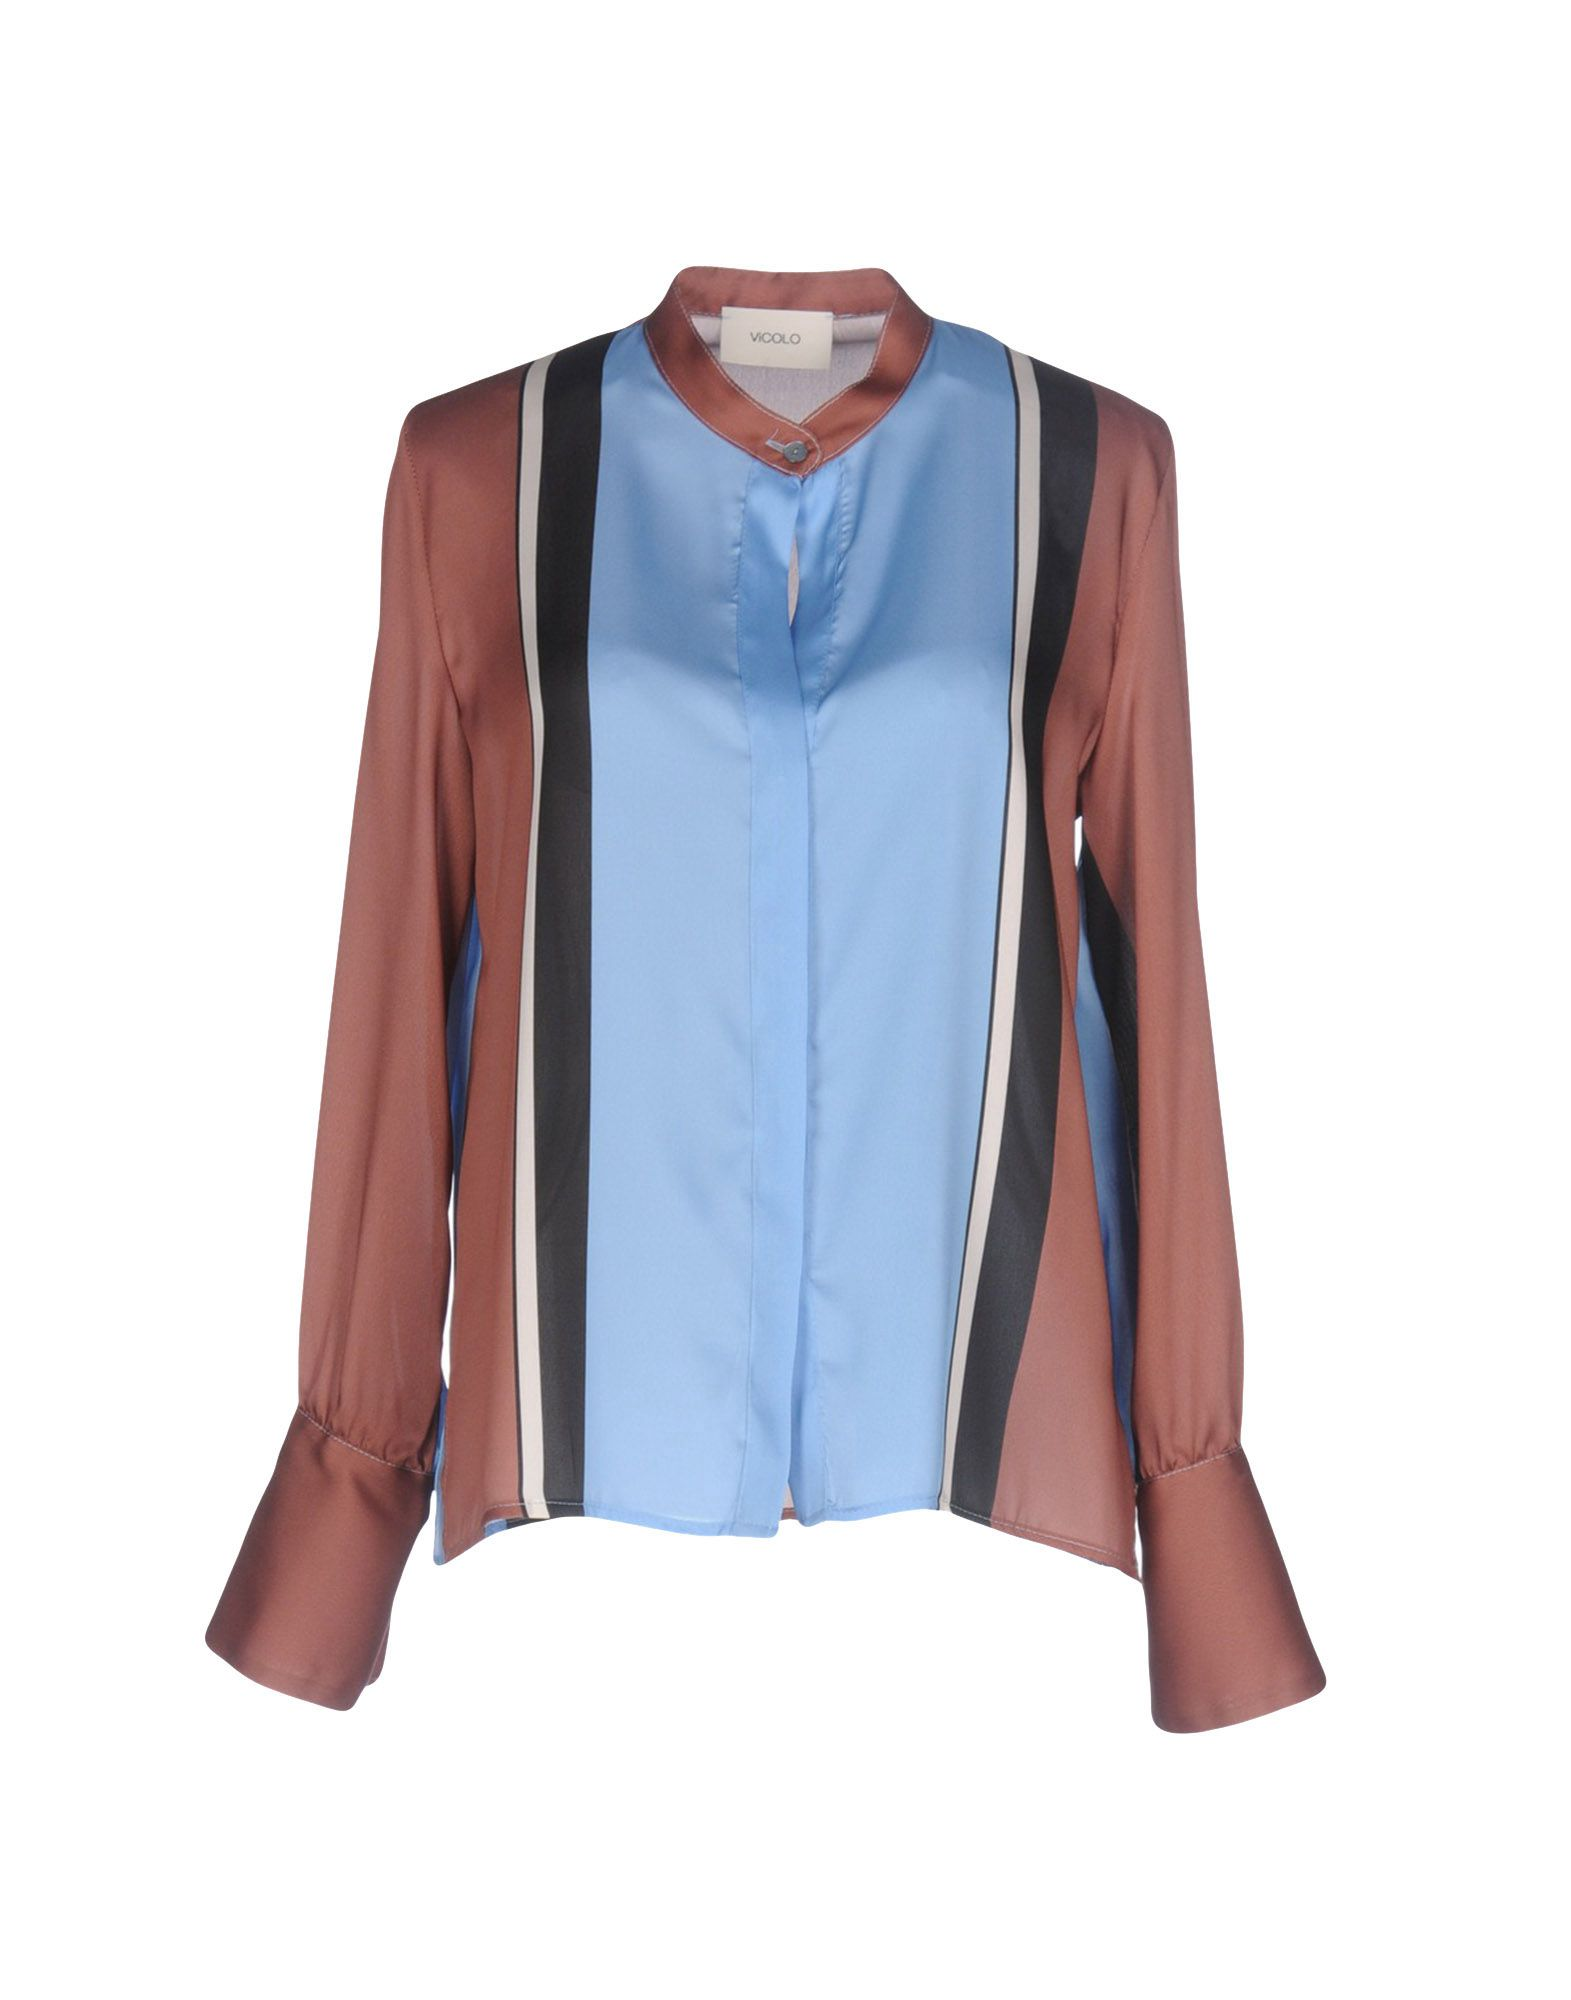 VICOLO Damen Hemd Farbe Braun Größe 4